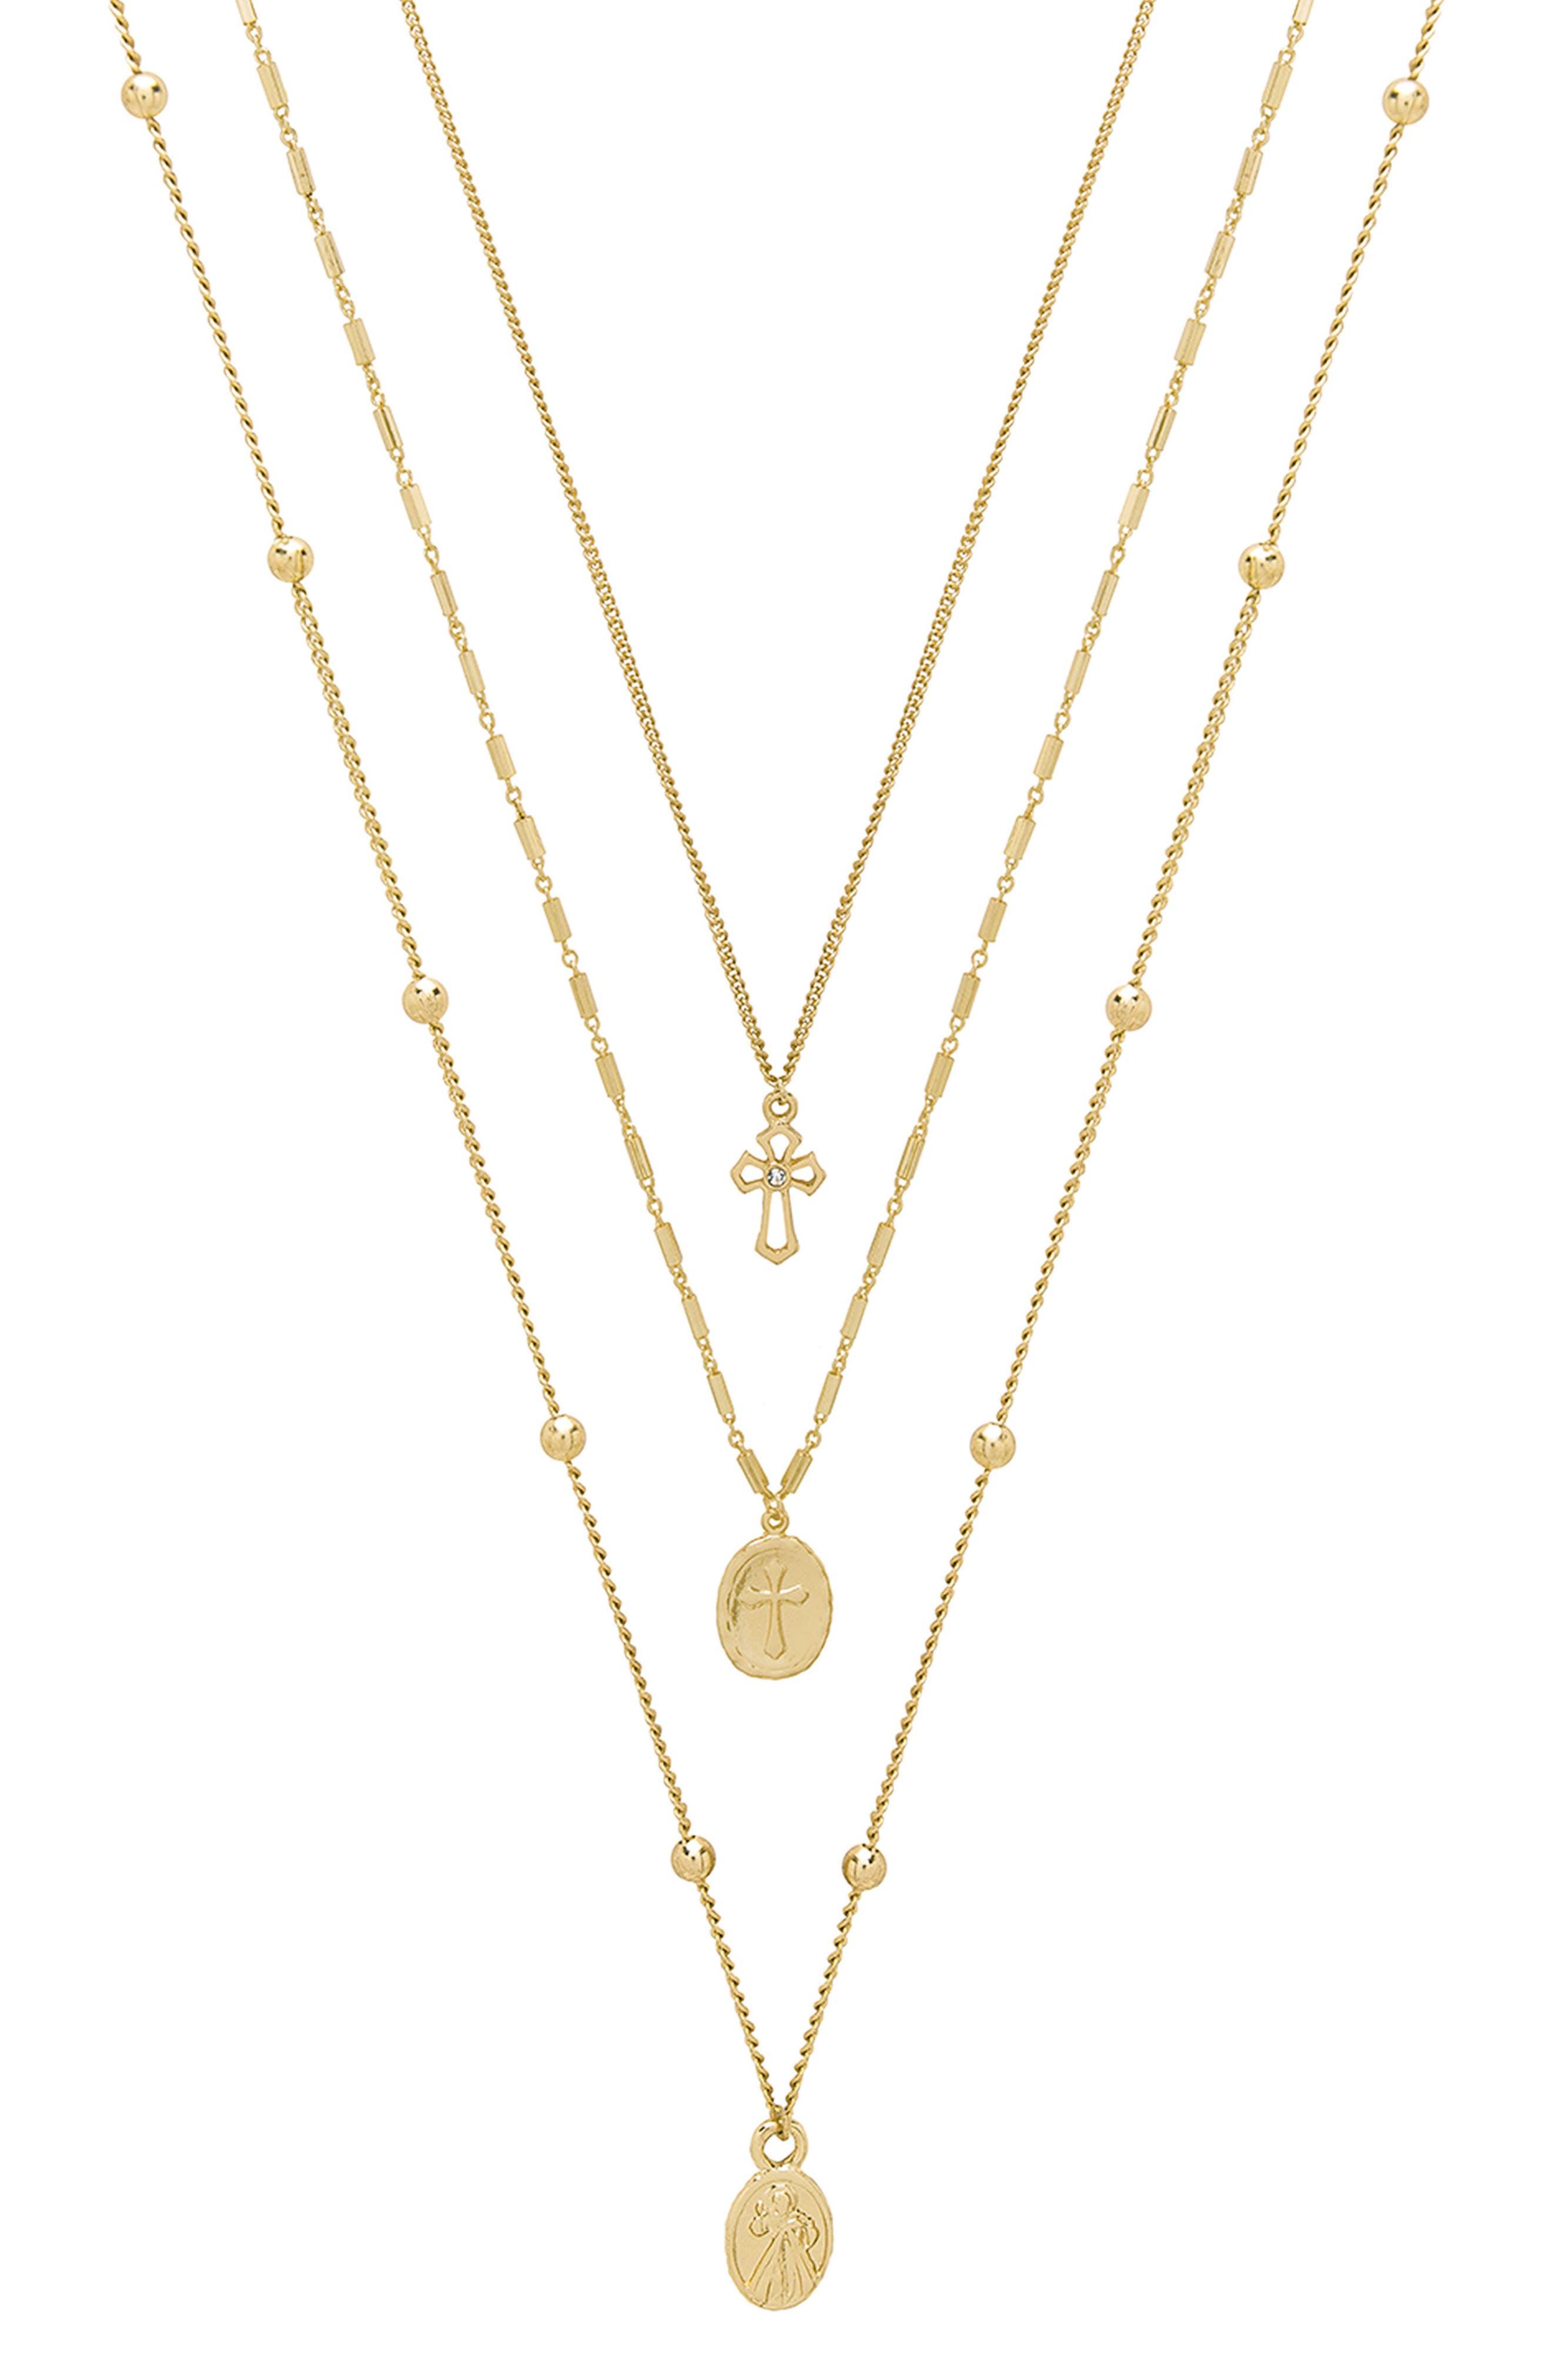 Set of 3 Cross Necklaces,                         Main,                         color, 710